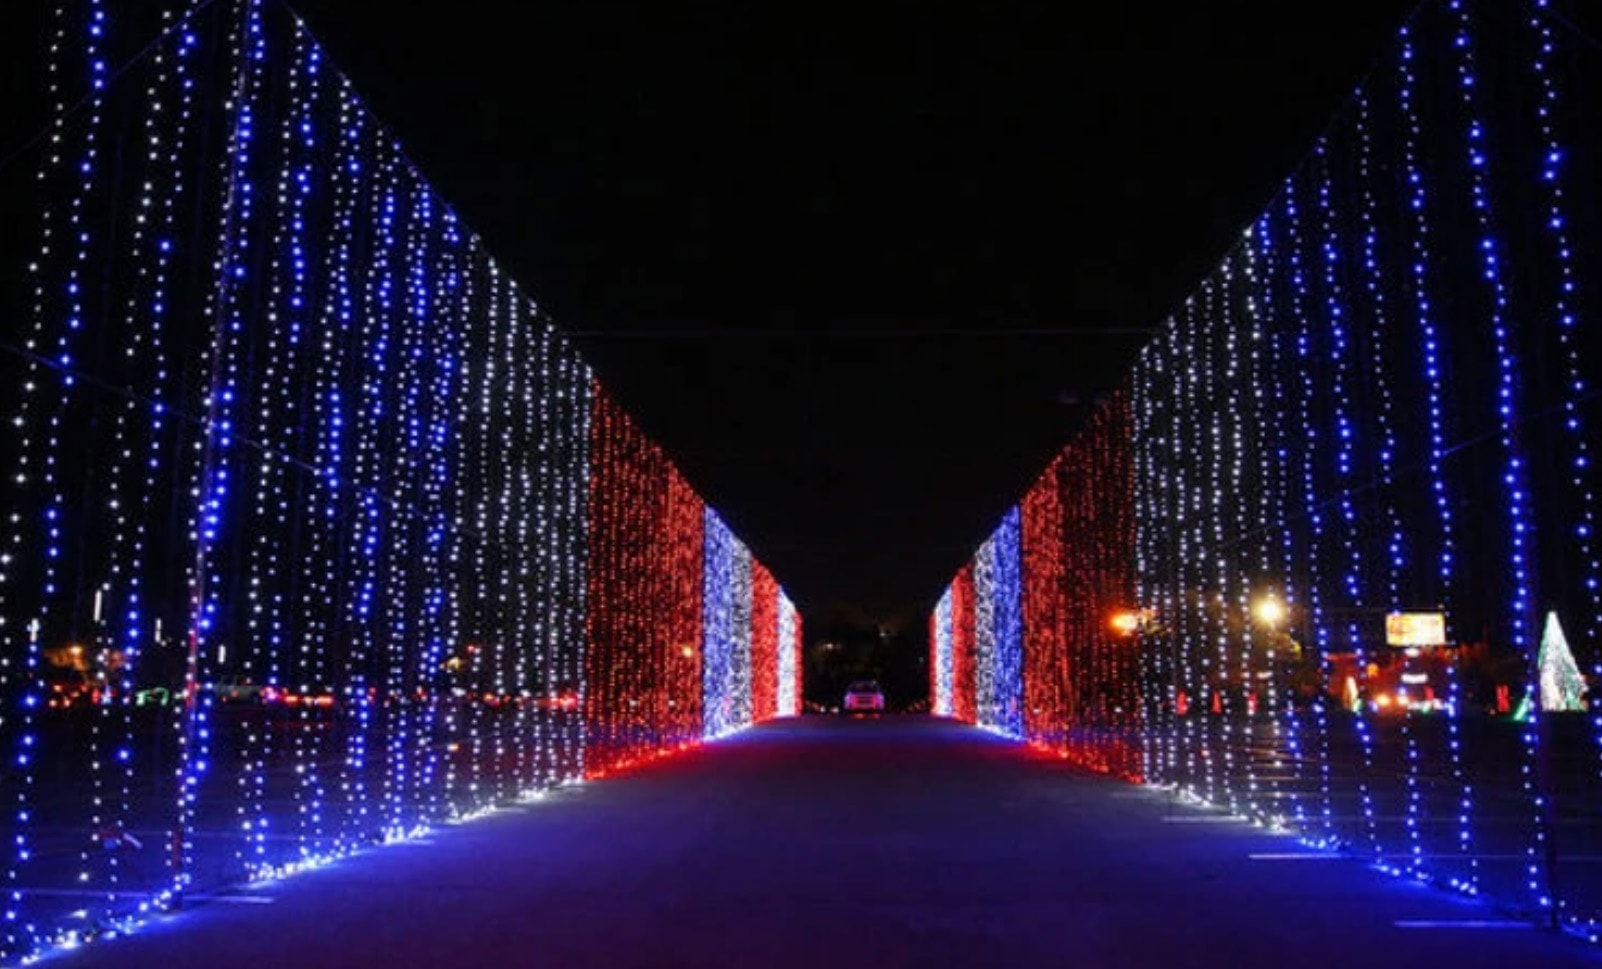 Wonderlight wall of lights